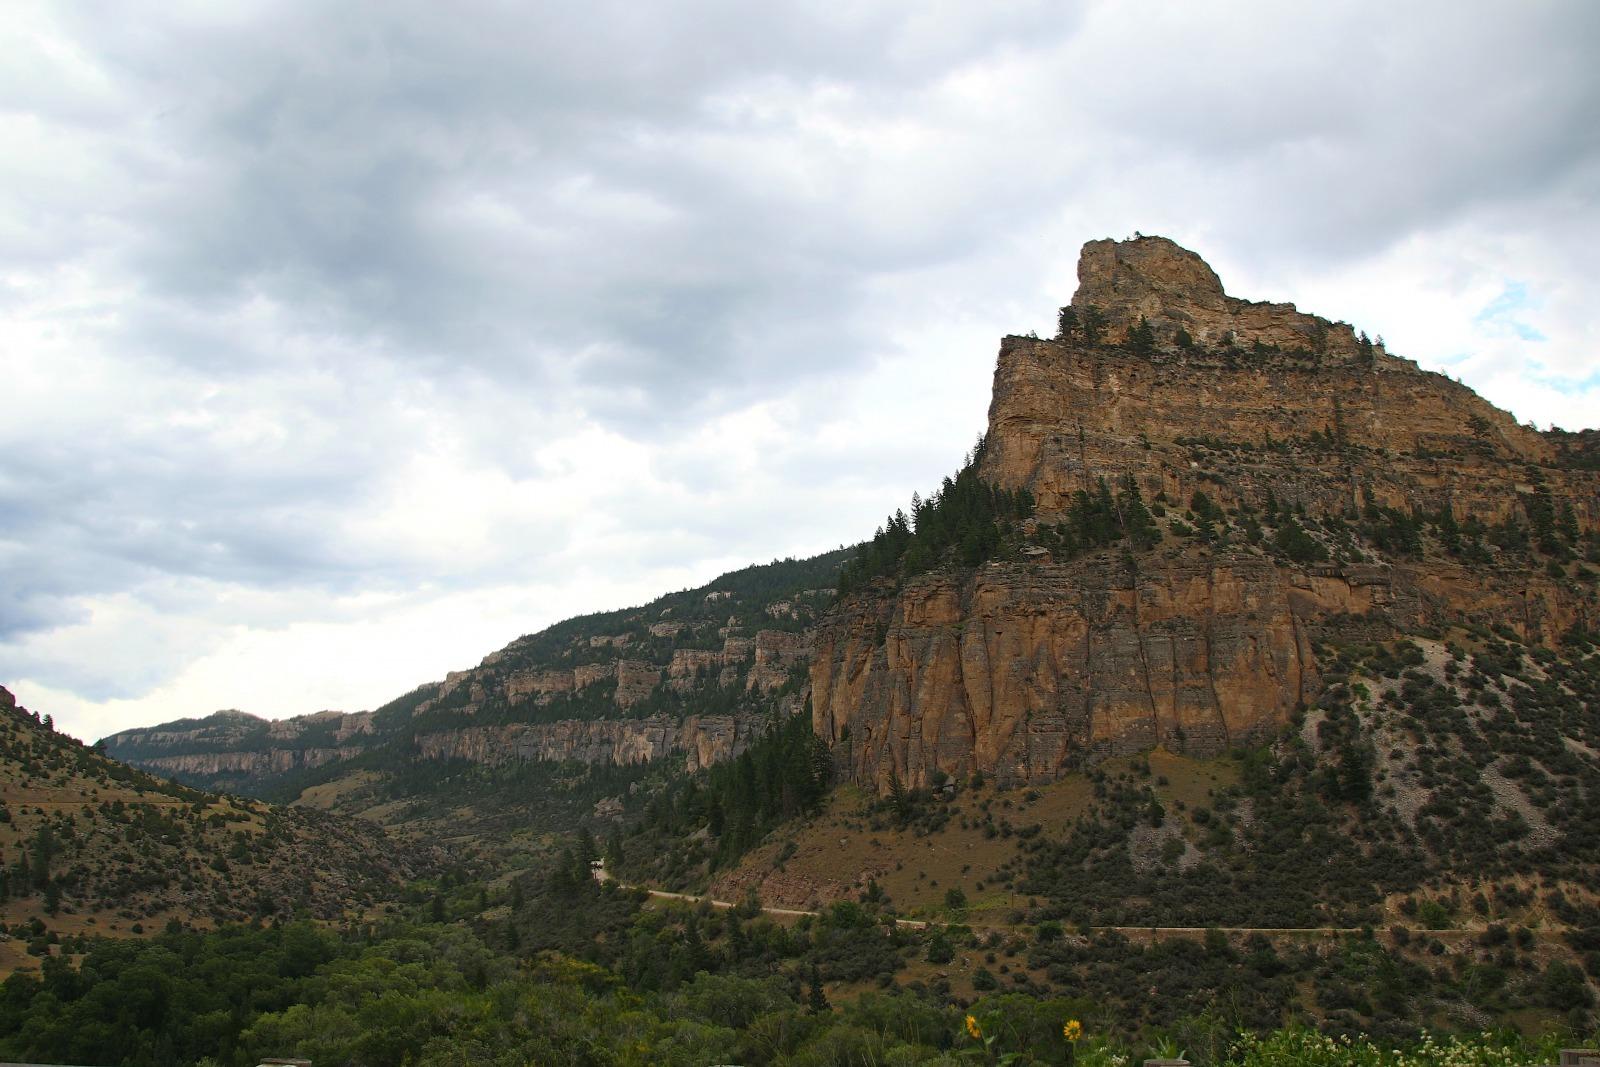 Cliffs in Tensleep Canyon, Wyoming.